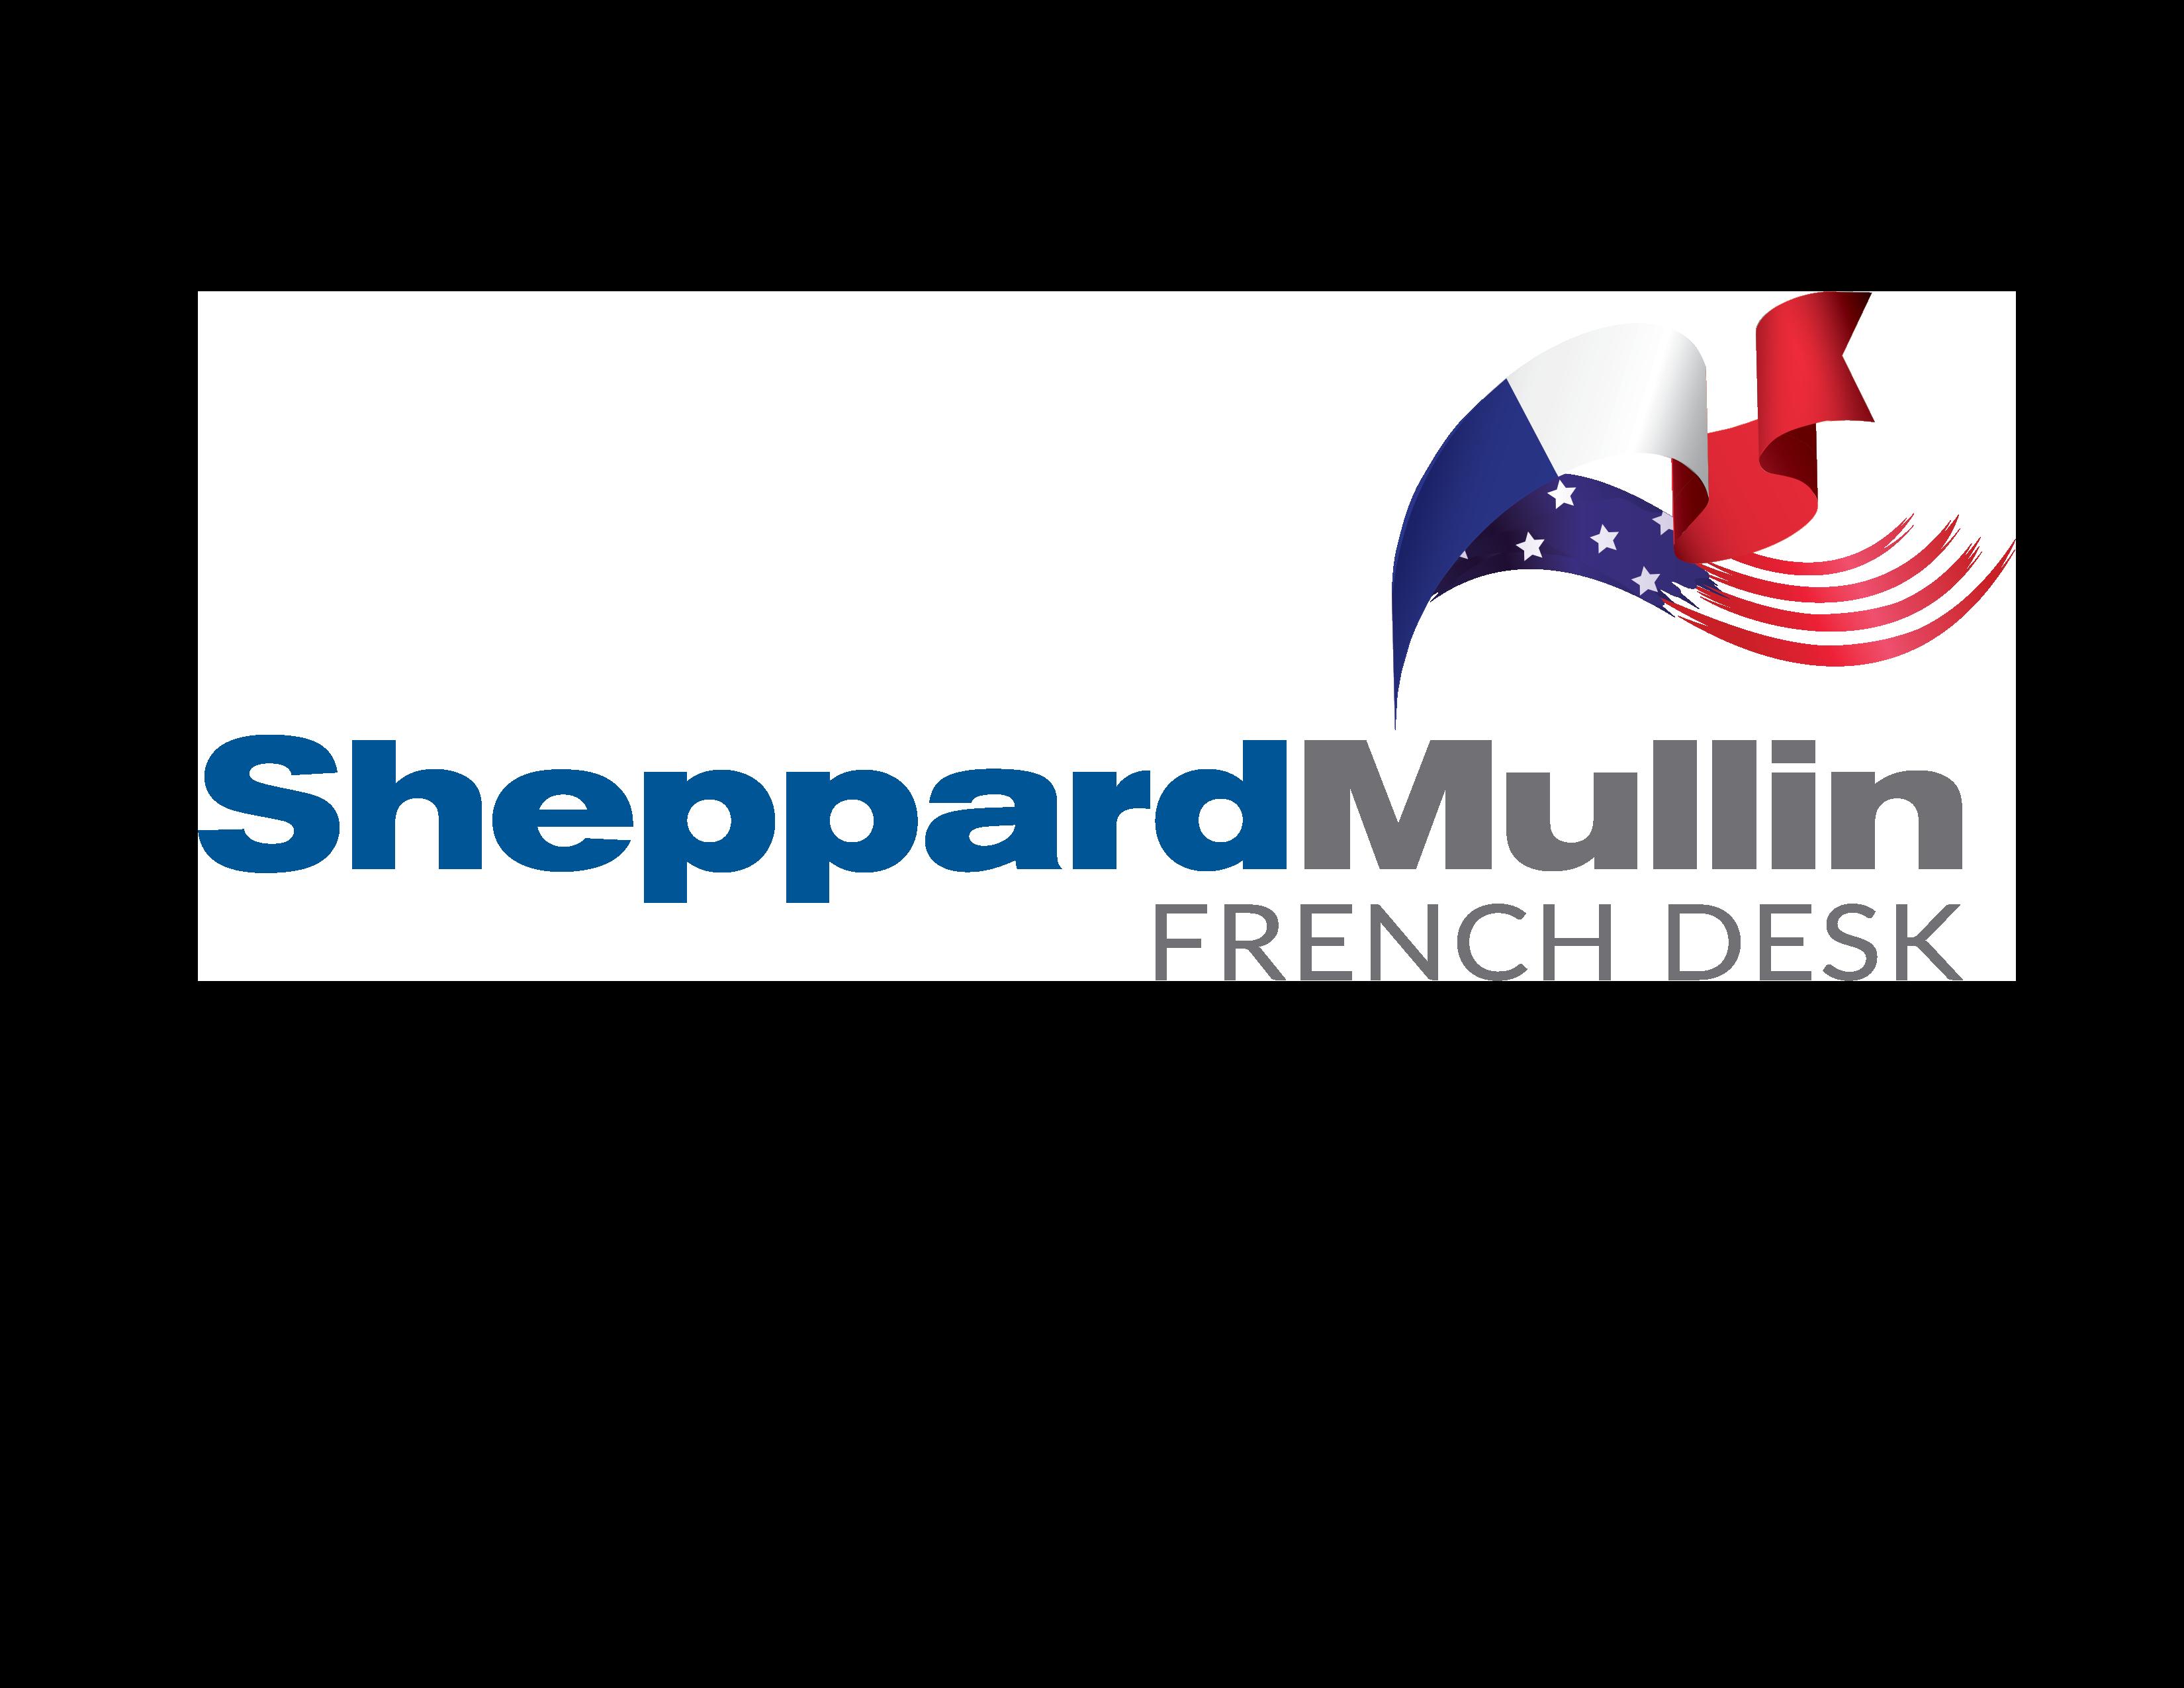 Sheppard Mullin